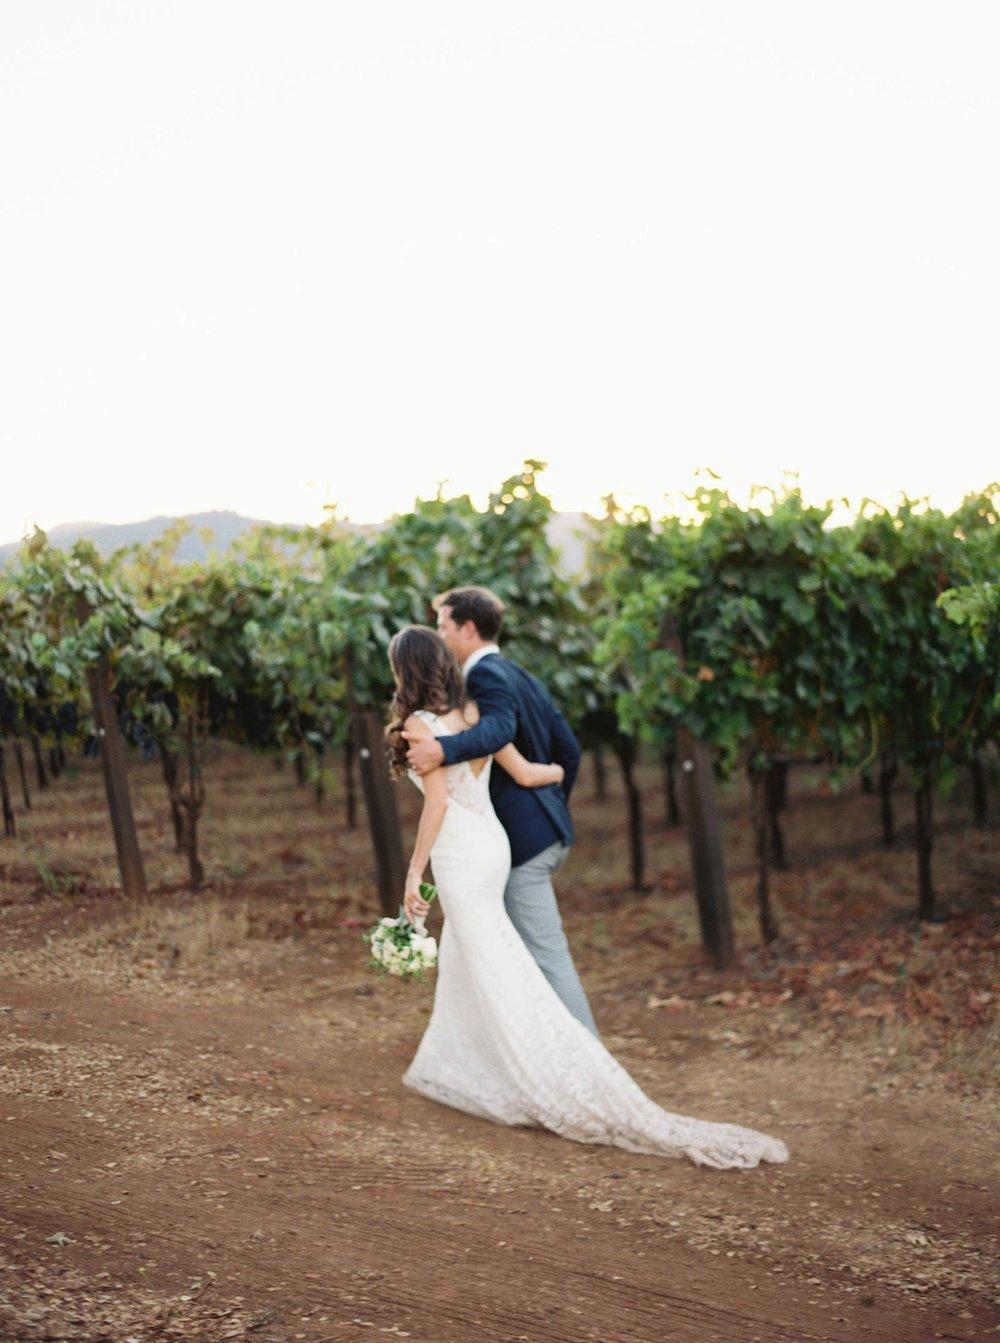 Napa-wedding-Kunde-winery-047.jpg